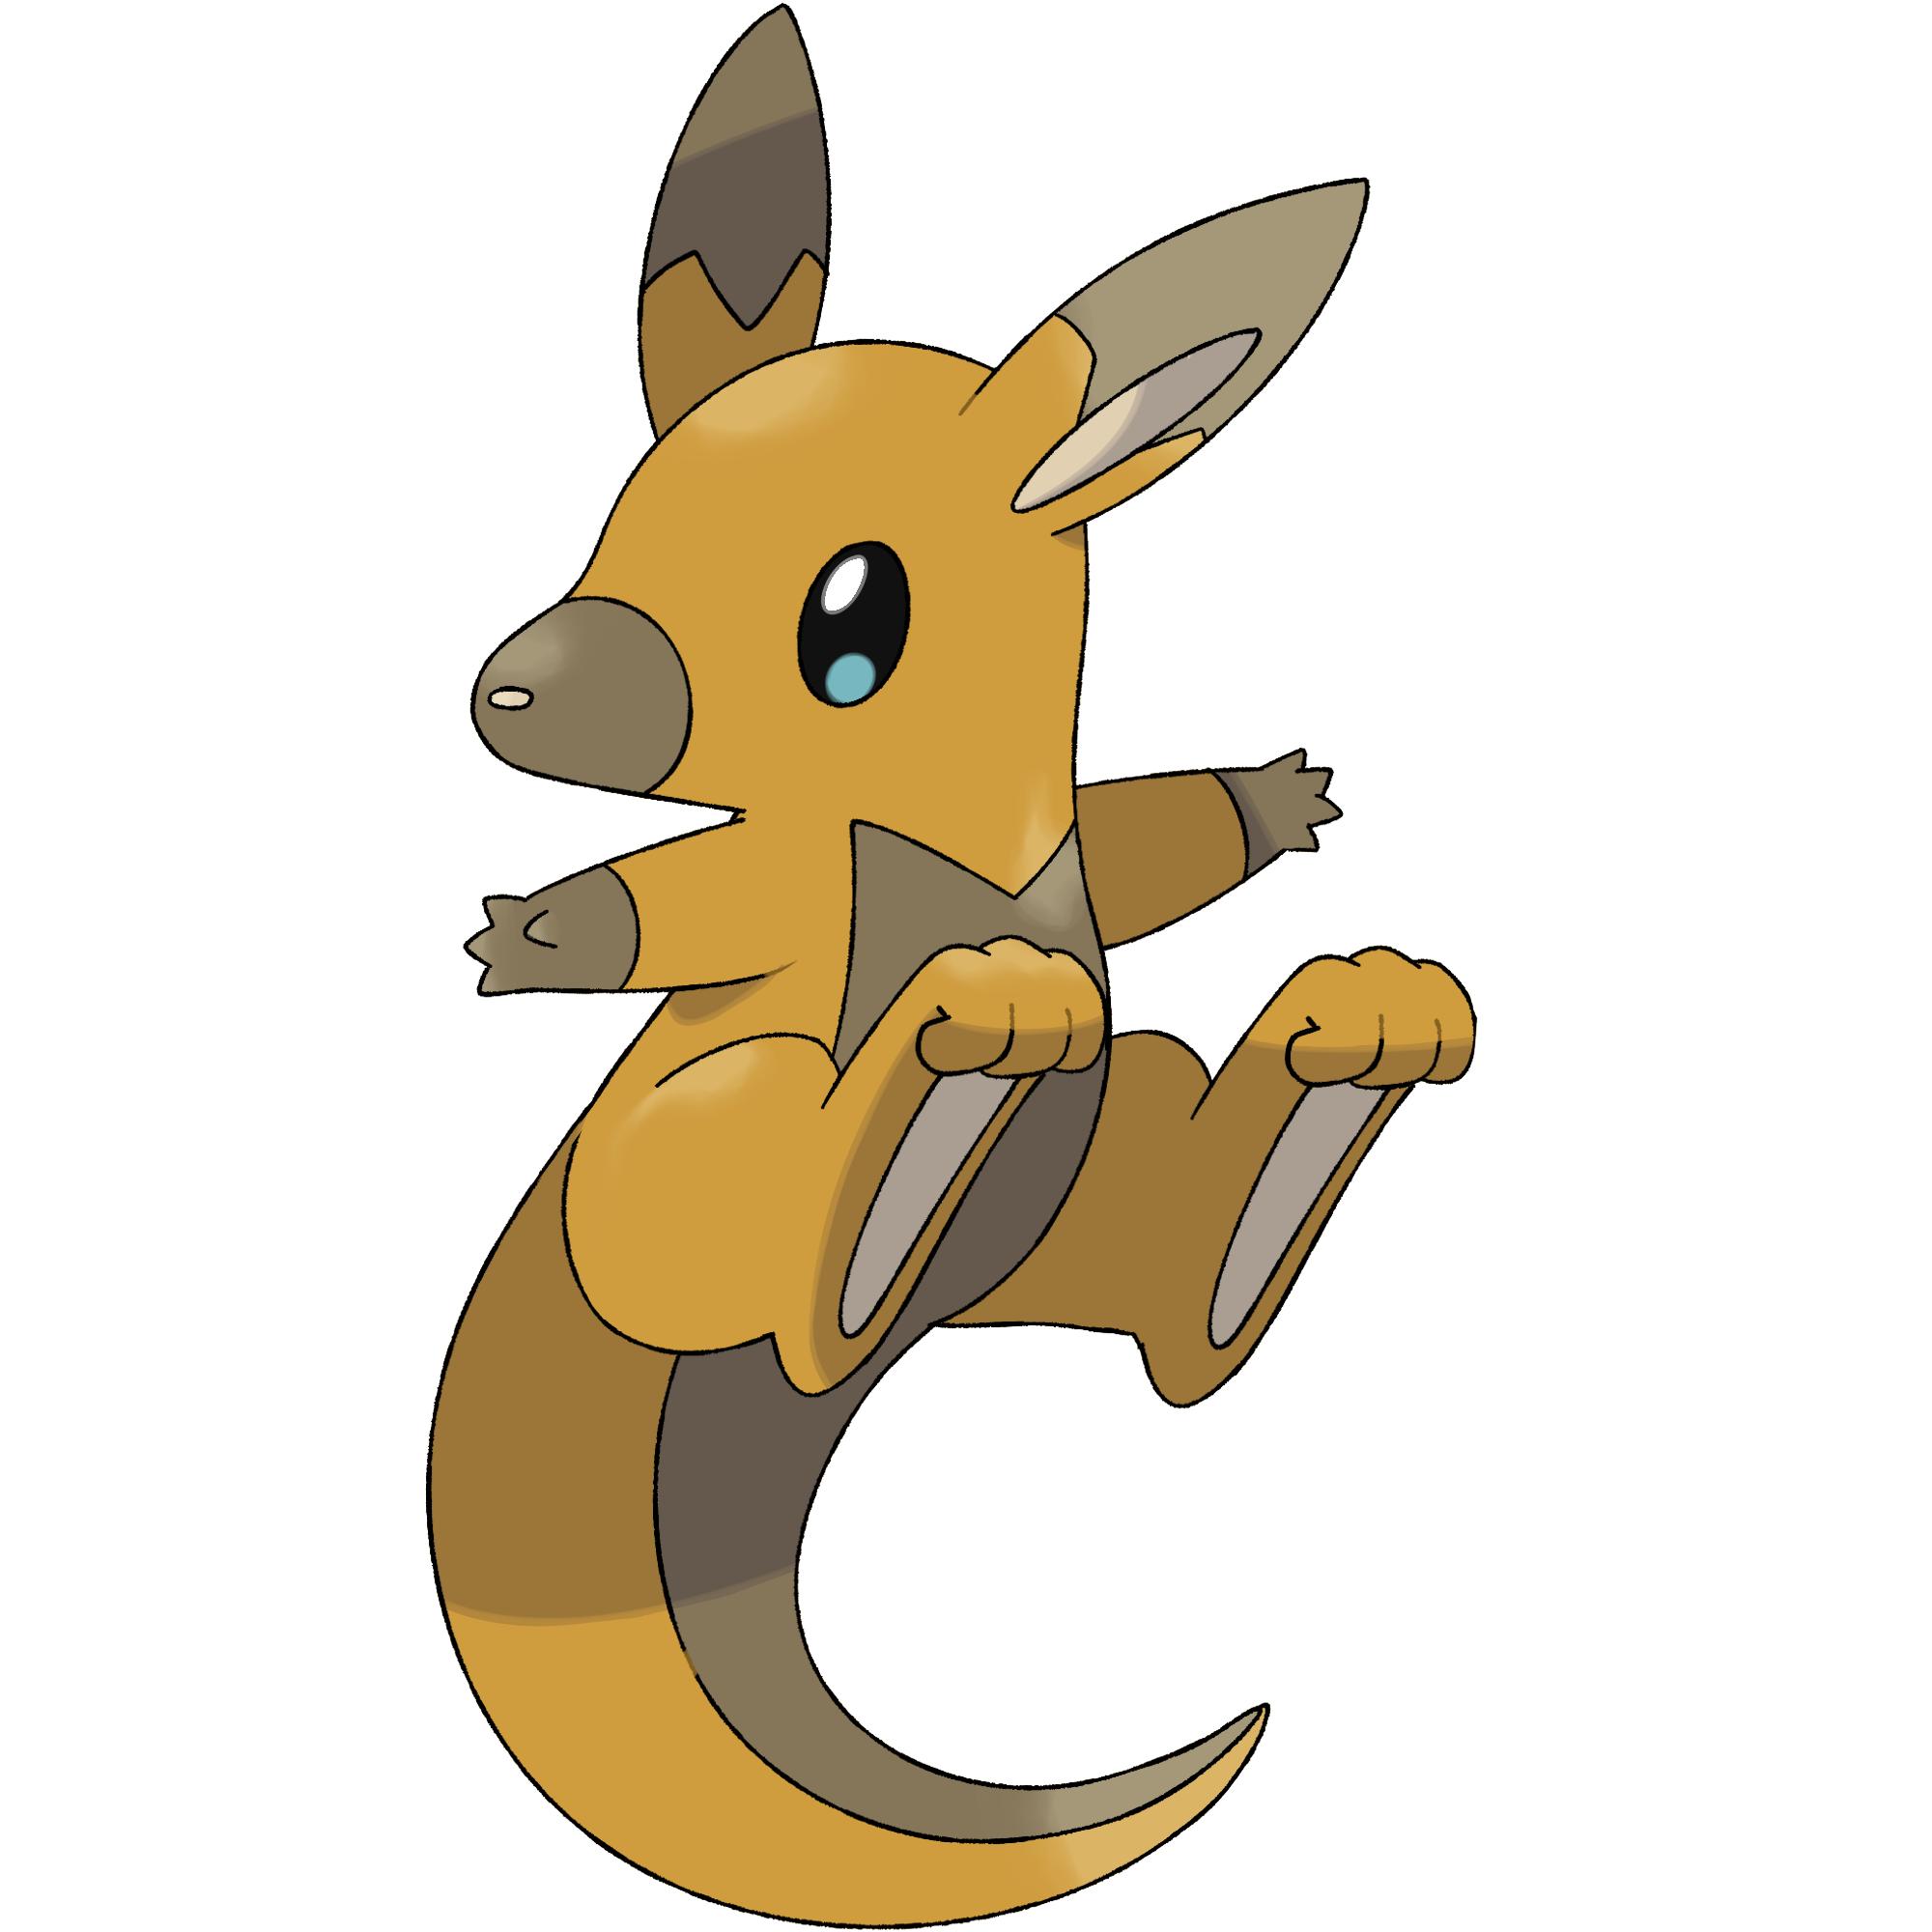 Footprint clipart kangaroo. Wallabound darkandwindie fakemon wiki